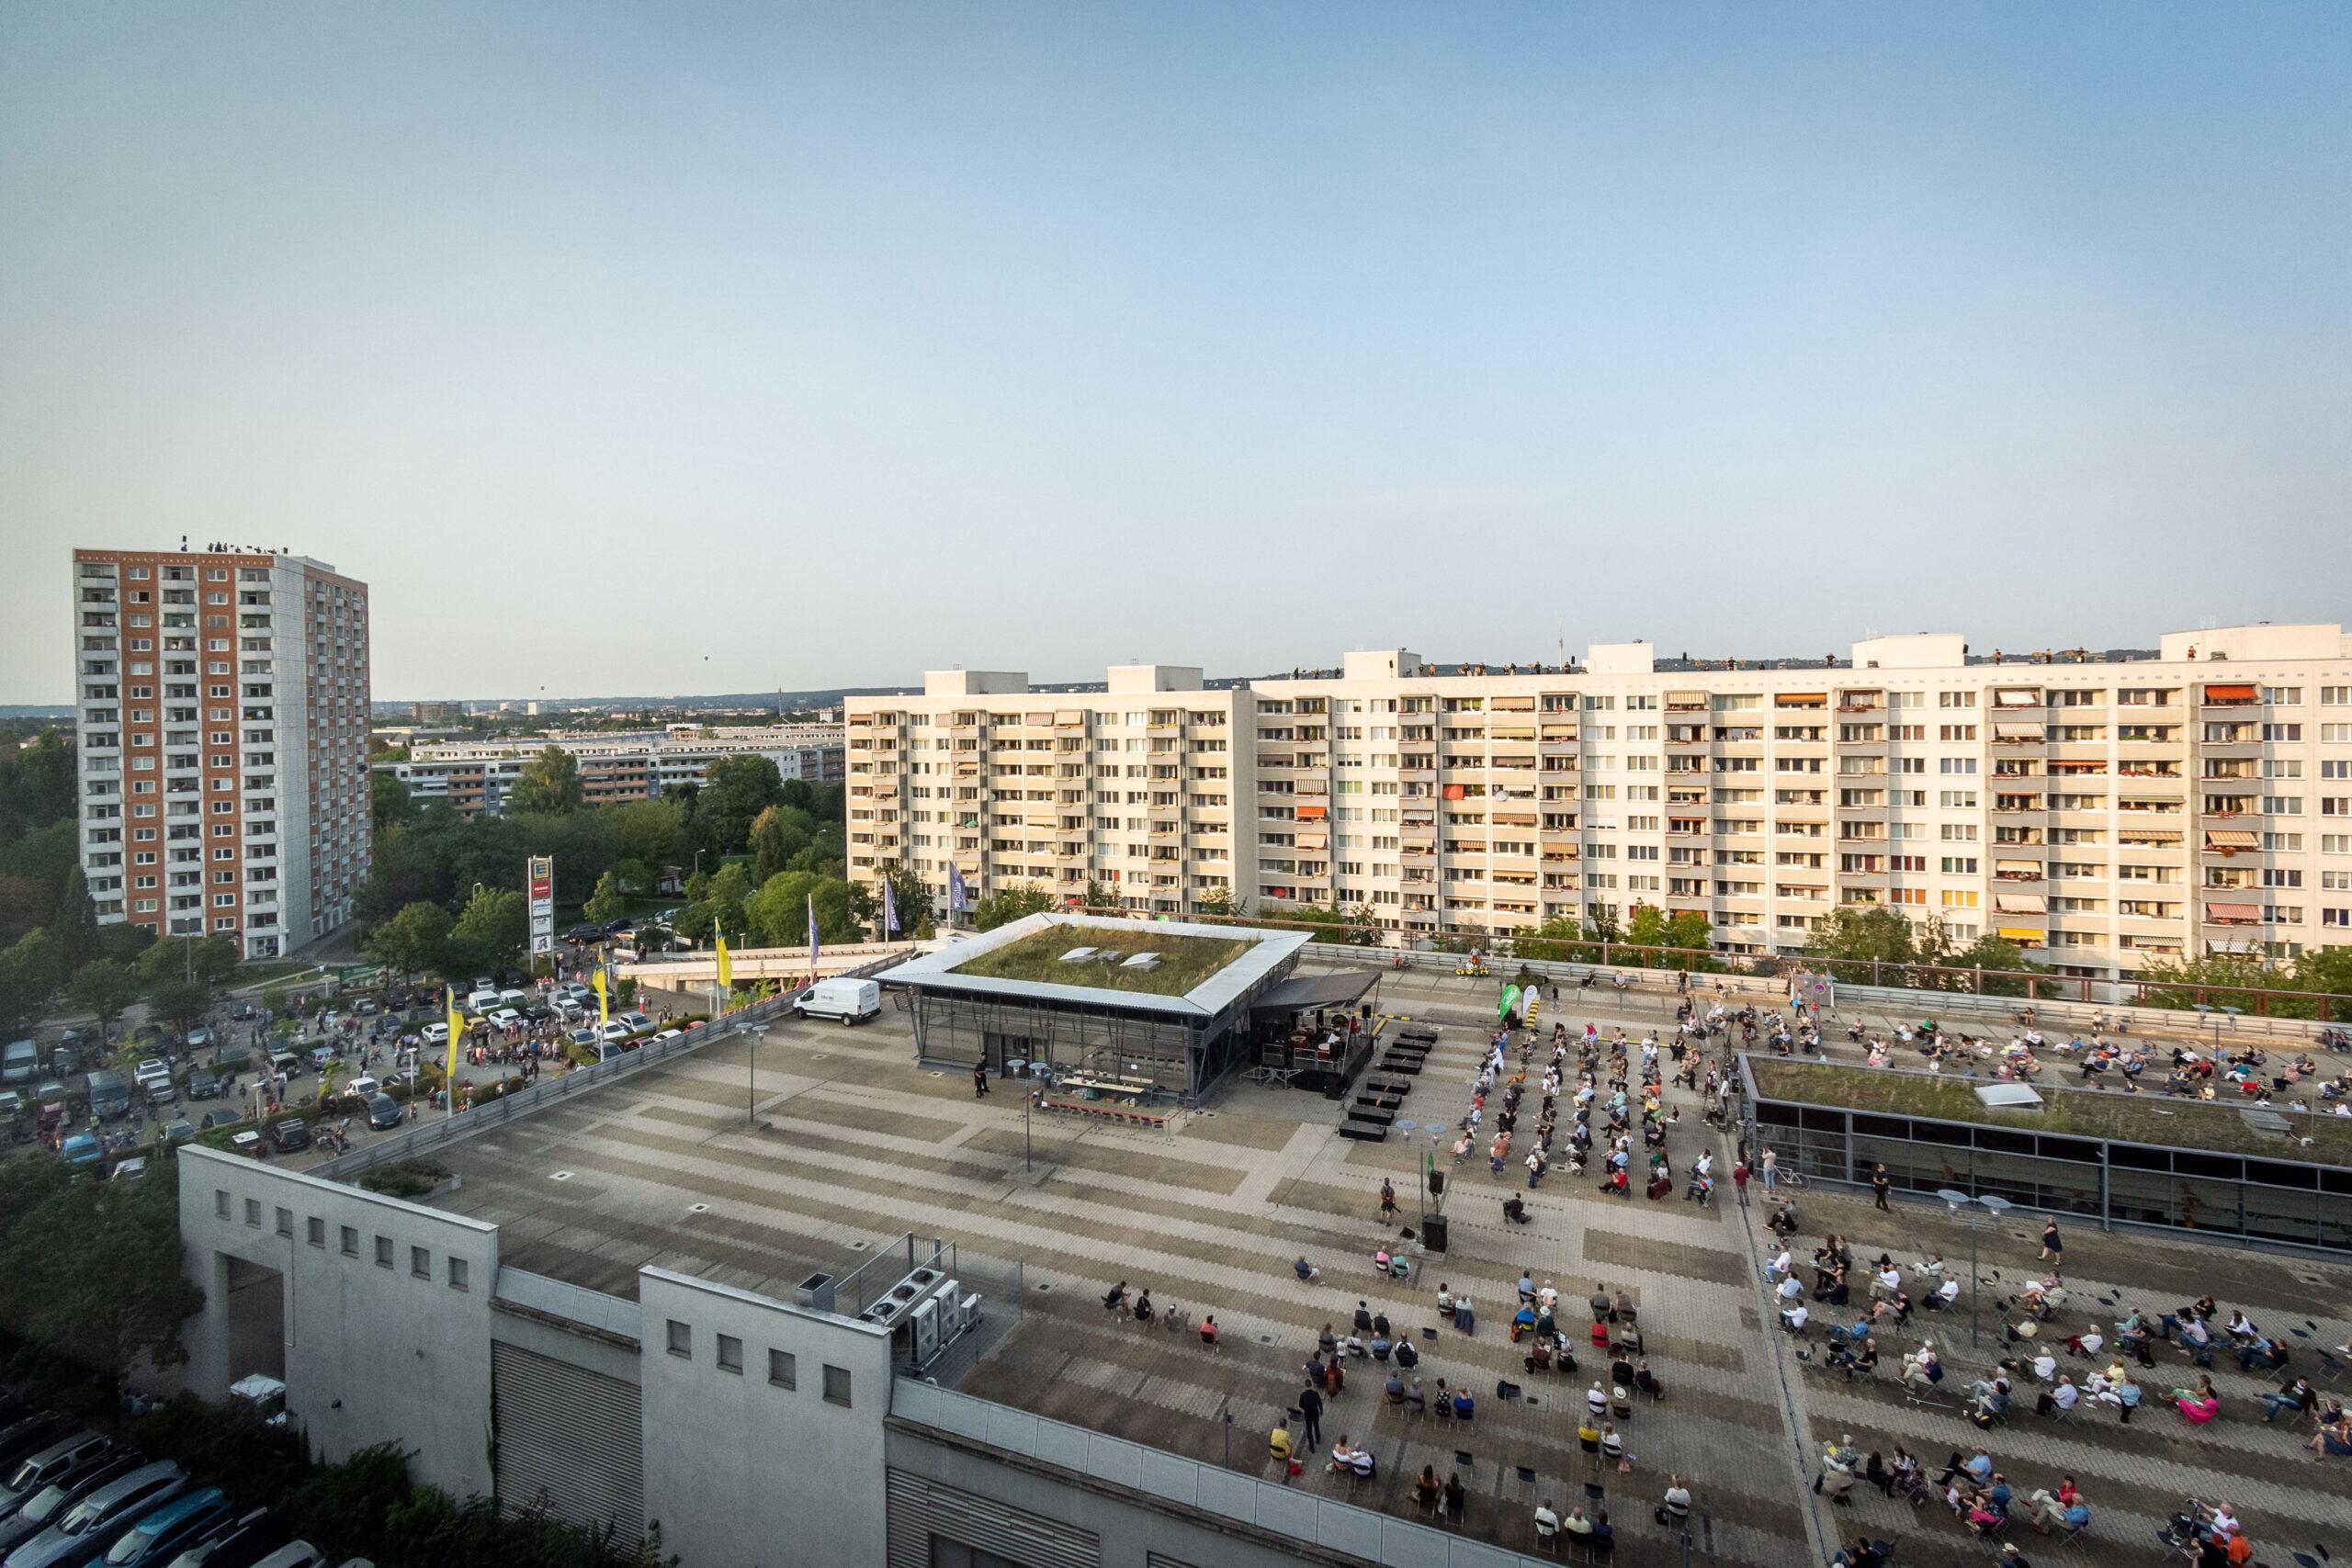 Himmel über Prohlis - Eventfotografie: Parkdeck des Prohliszentrums und umliegende Häuser